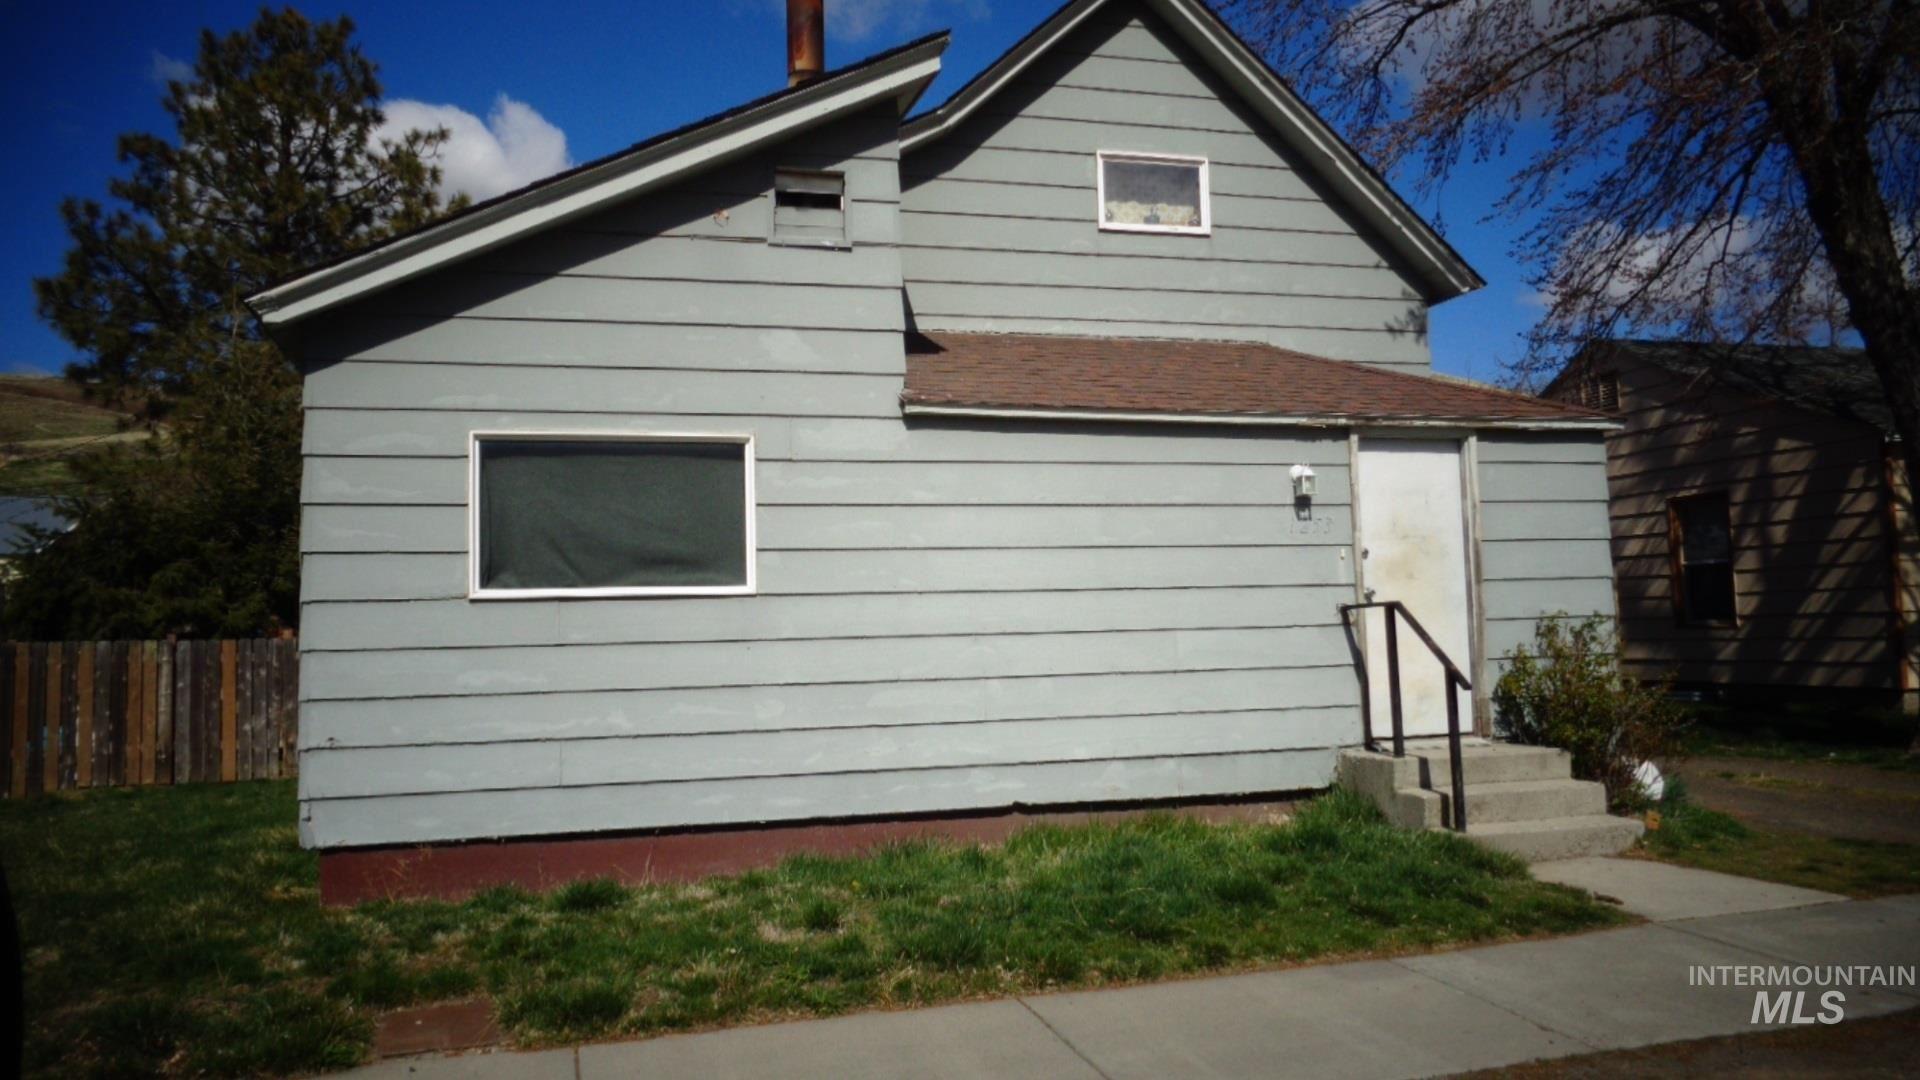 Photo of 1253 Columbia street, Pomeroy, WA 99347 (MLS # 98797621)